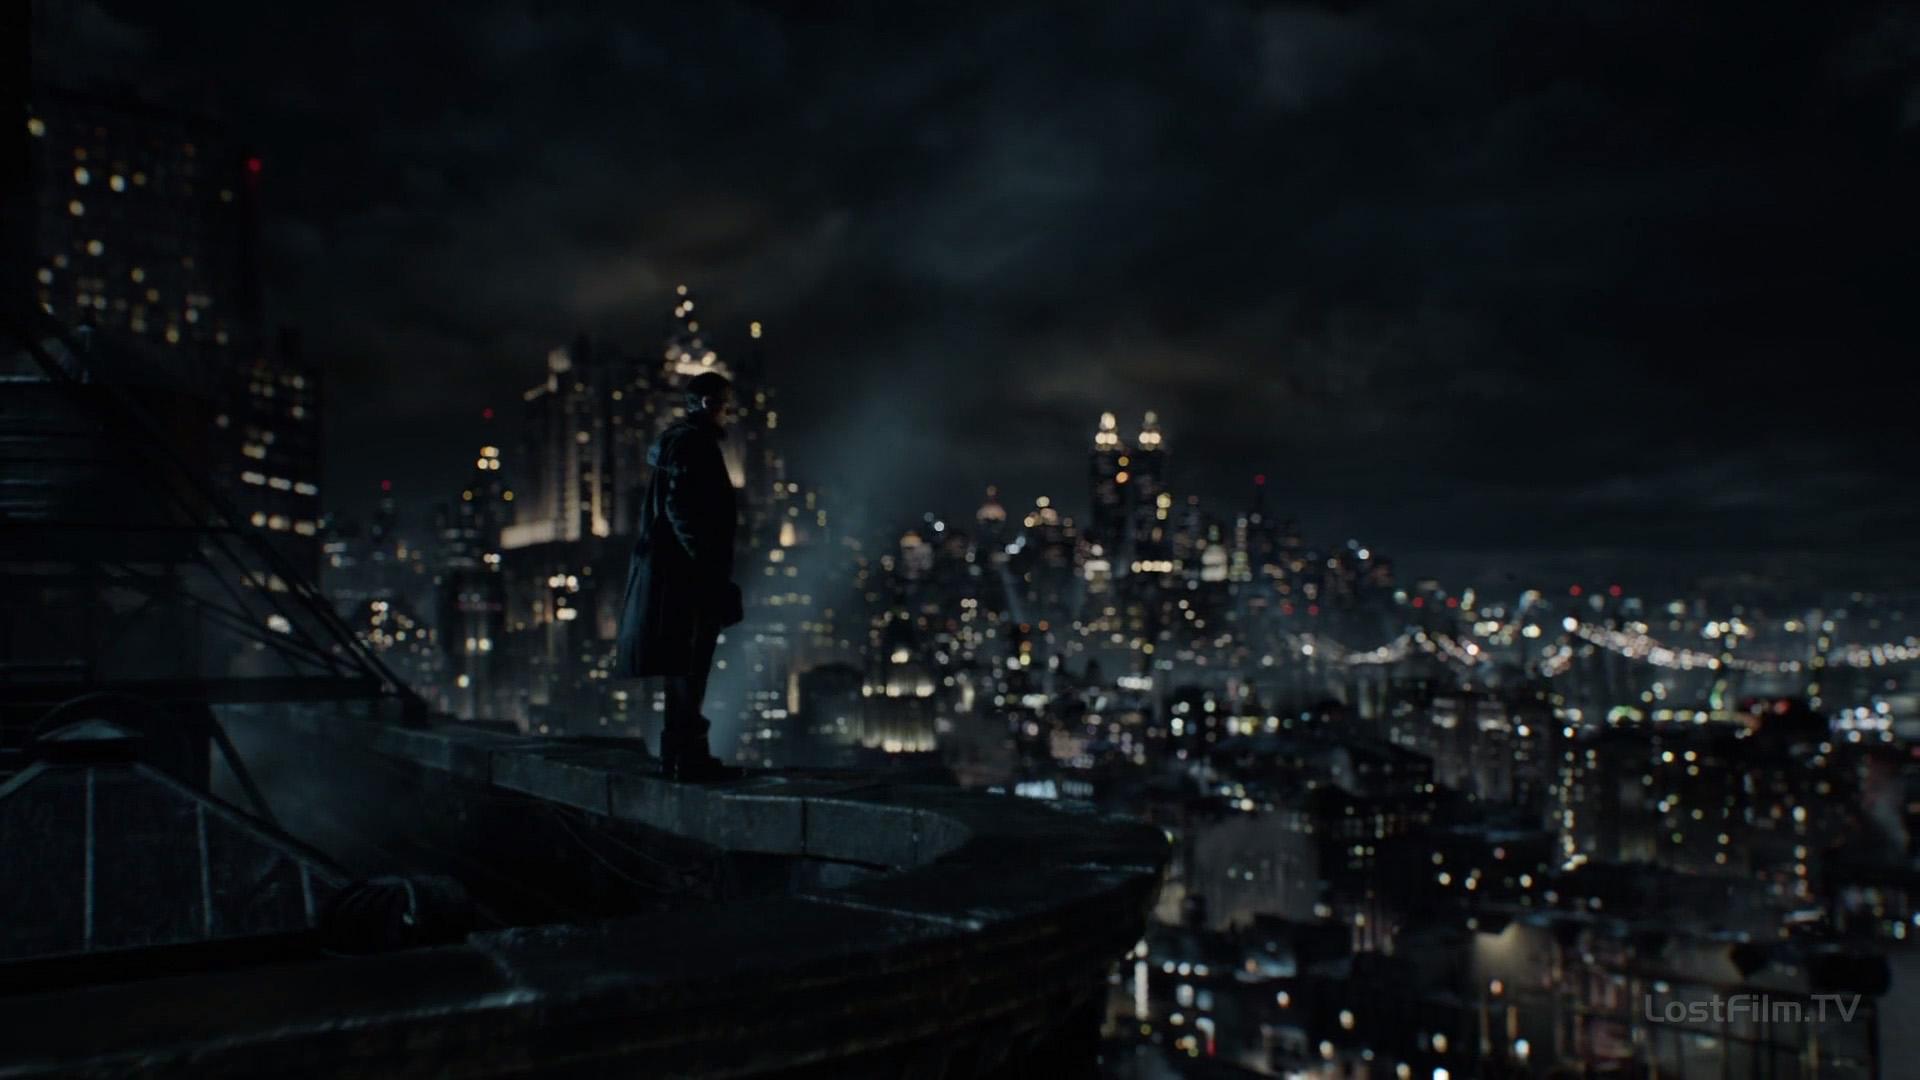 Готэм / Gotham [04x01-08 из 22] (2017) WEB-DLRip 1080p | LostFilm